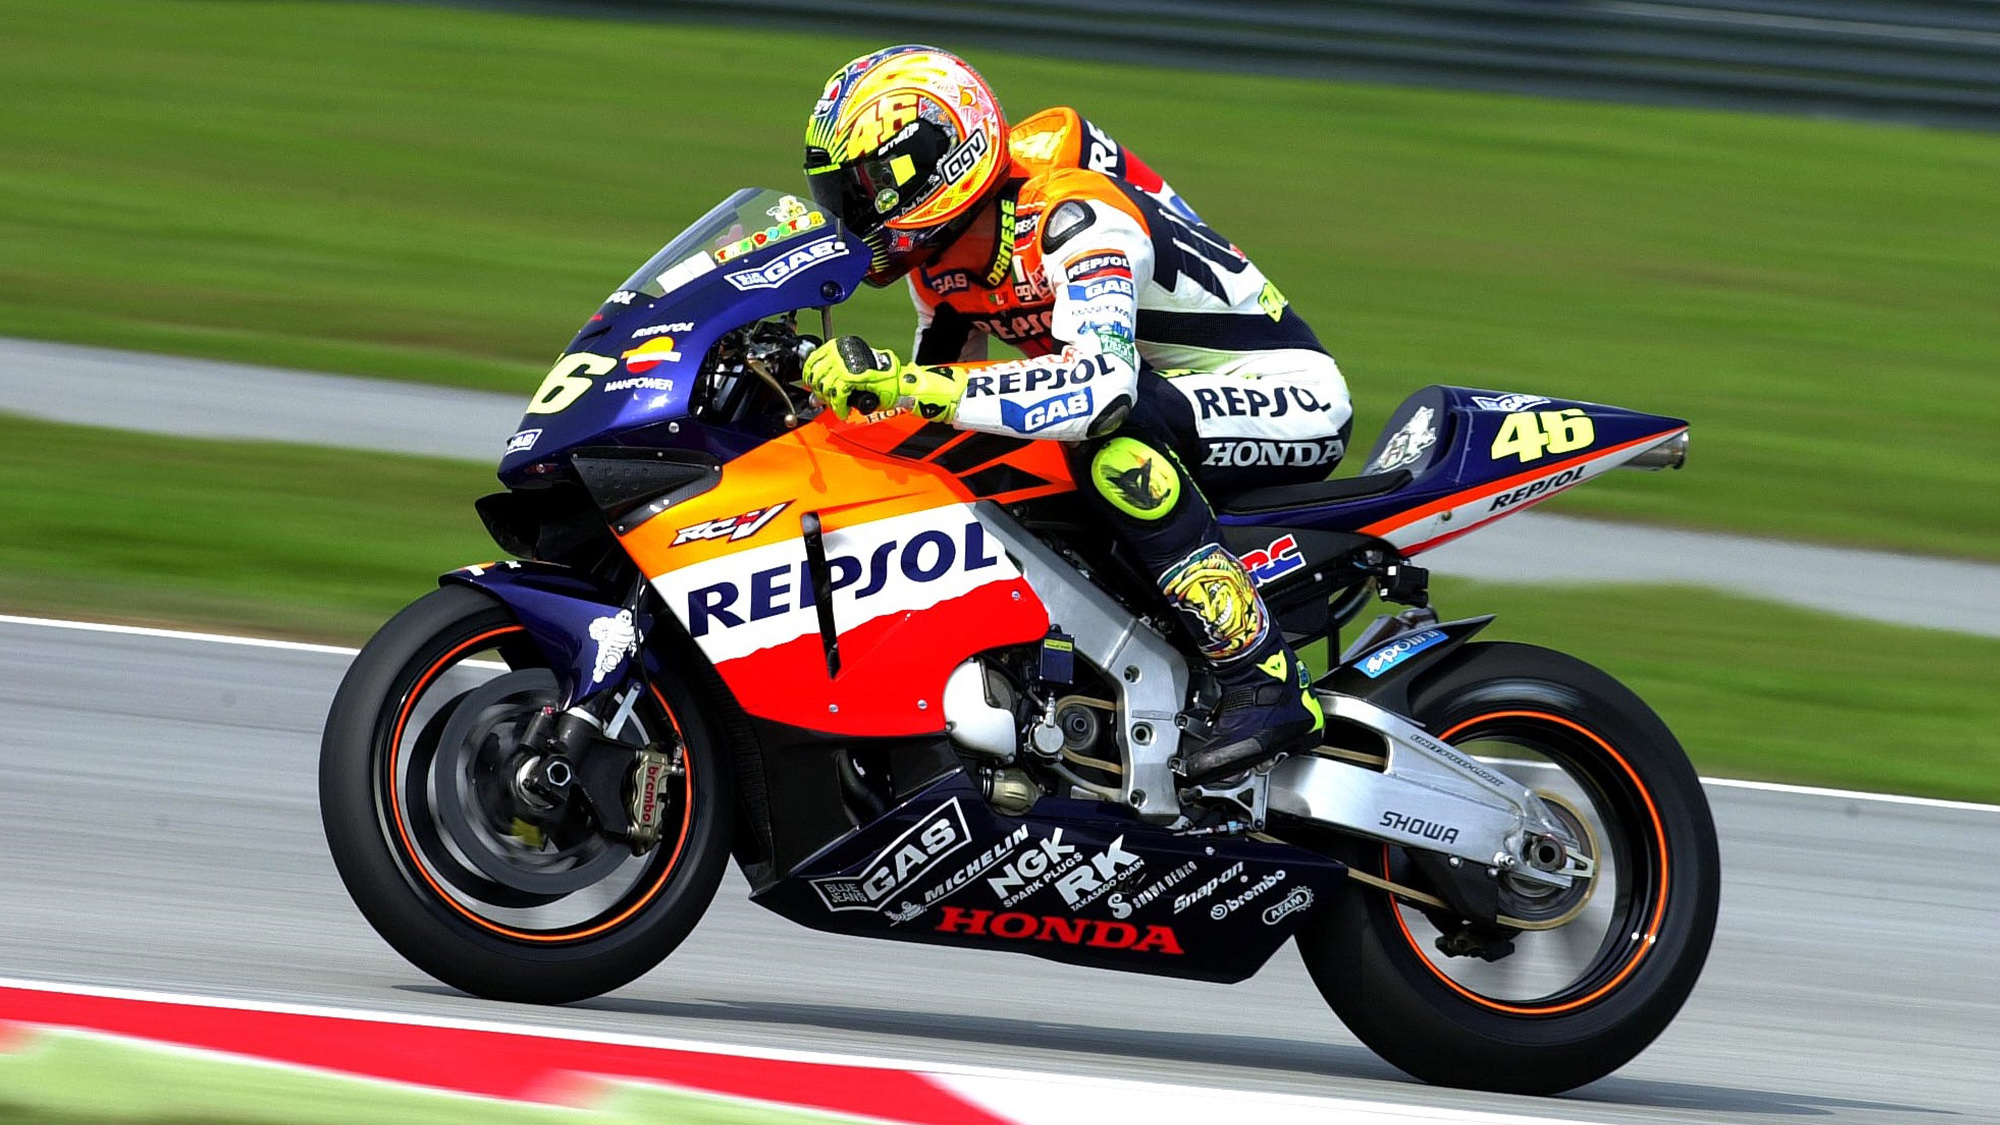 Valentino Rossi on his Honda in 2002